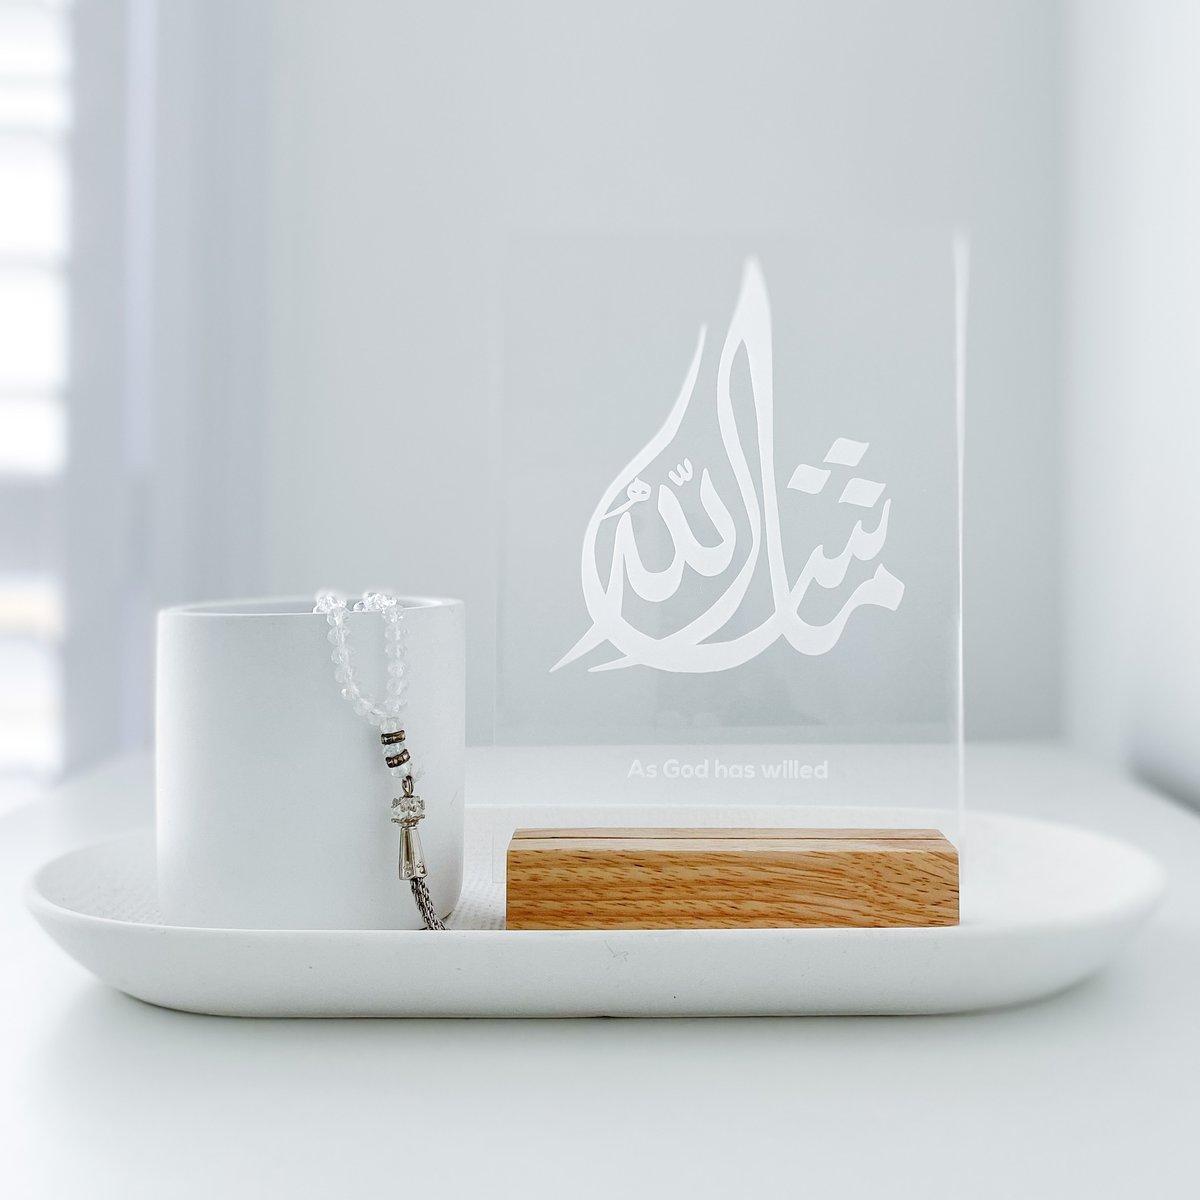 Image of acrylic mashallah